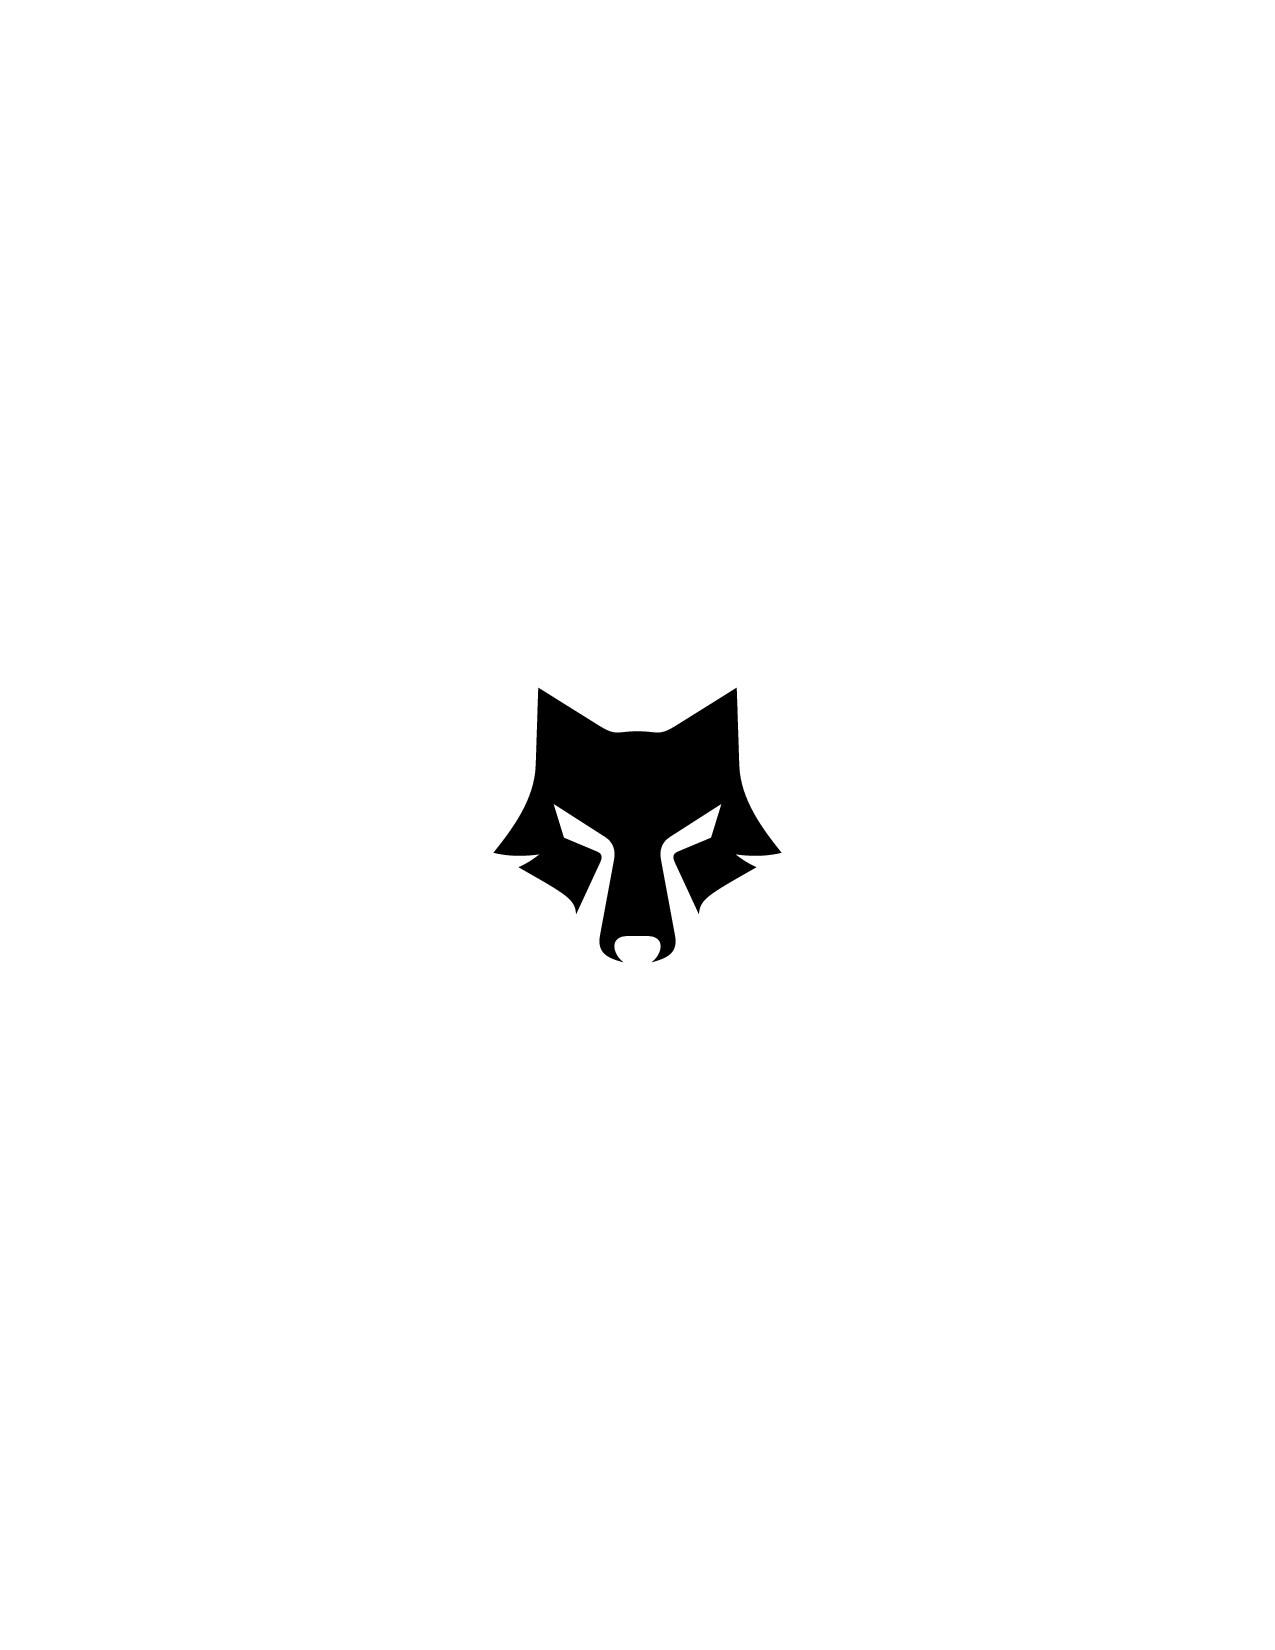 Stylized Wolf Head Logo Re-Design